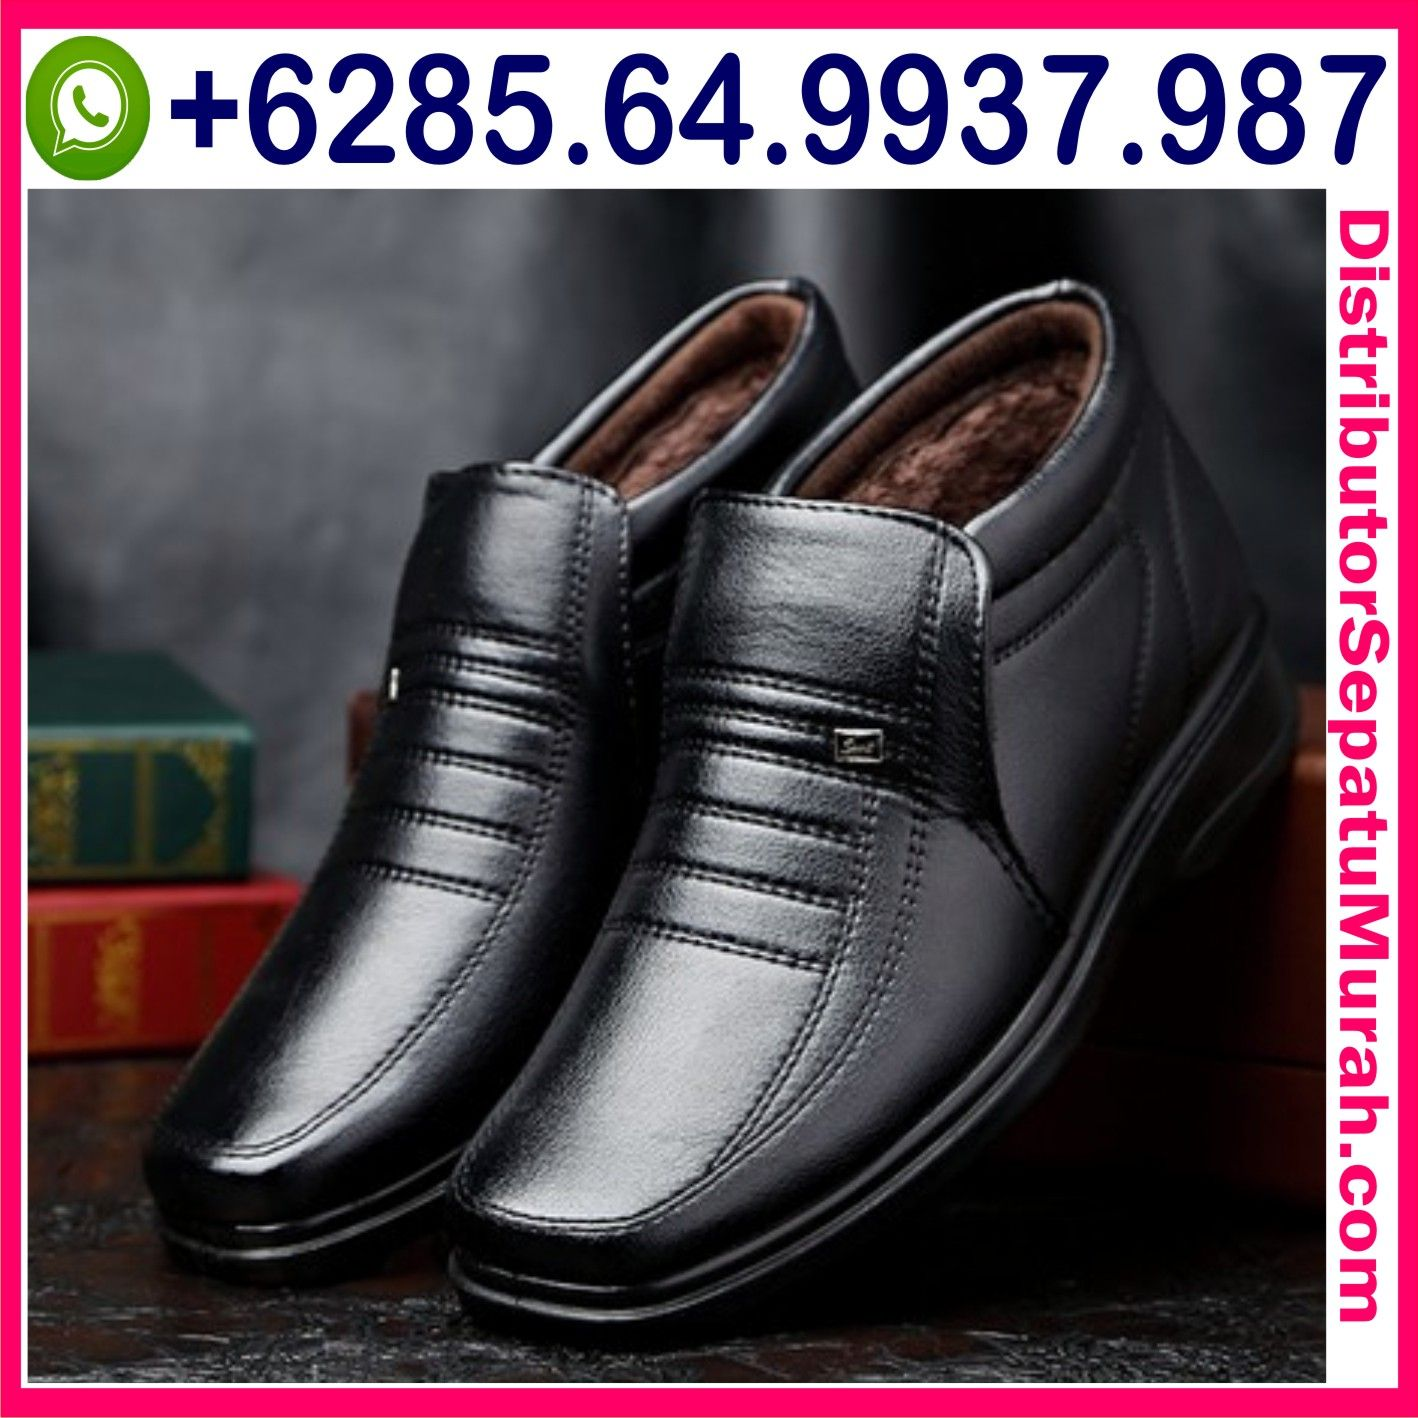 SEPATU PRIA (Dengan gambar) Sepatu pria, Sepatu, Pria